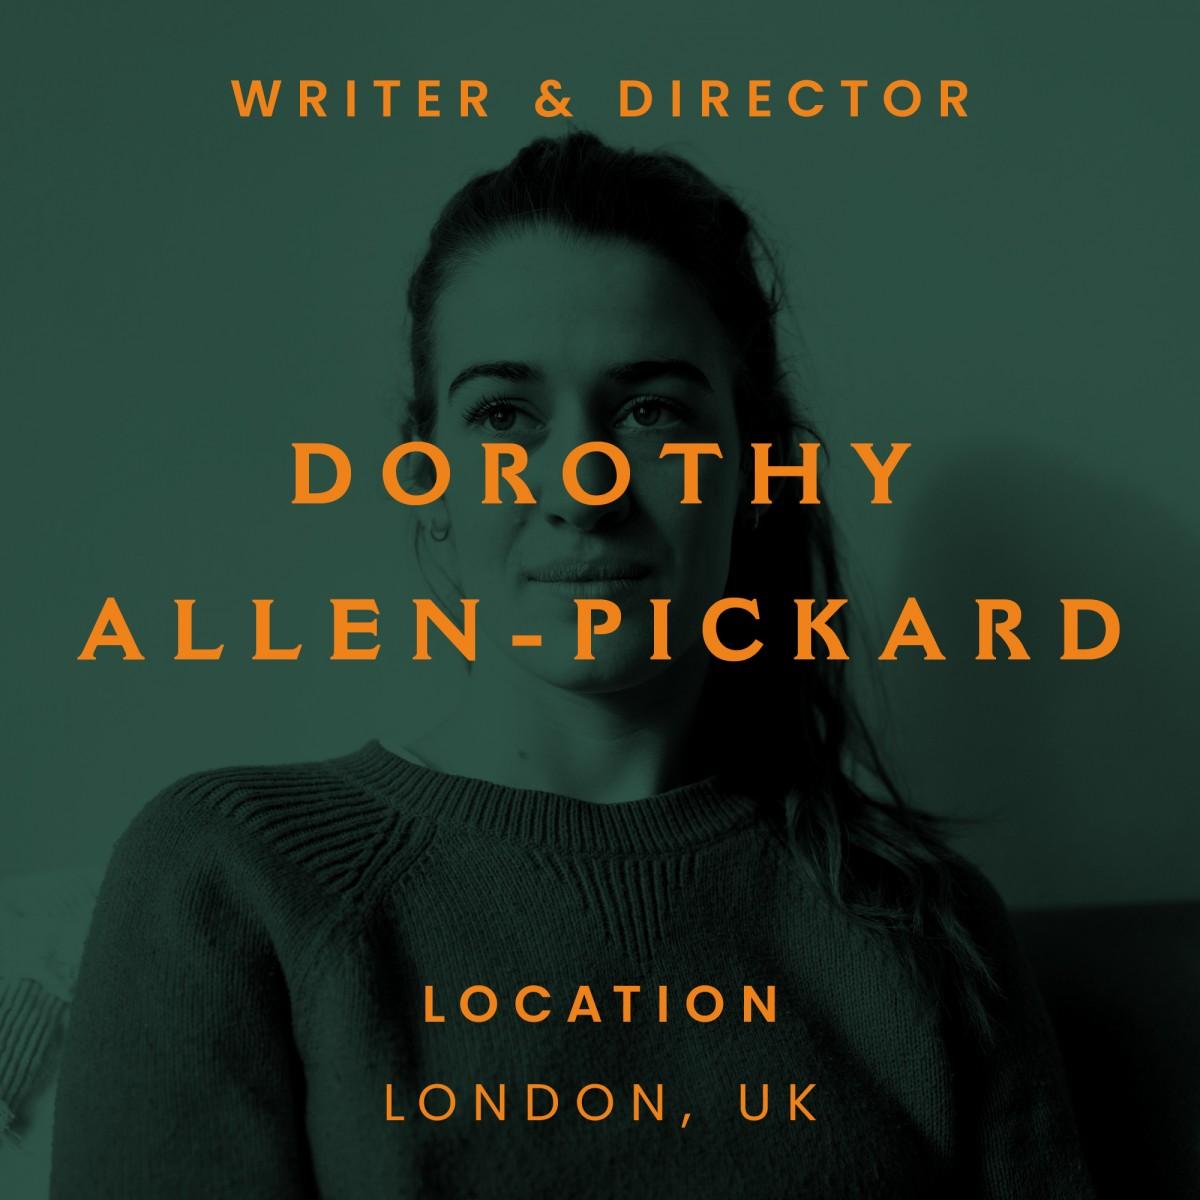 dorothy allen-pickard, London, director, writer